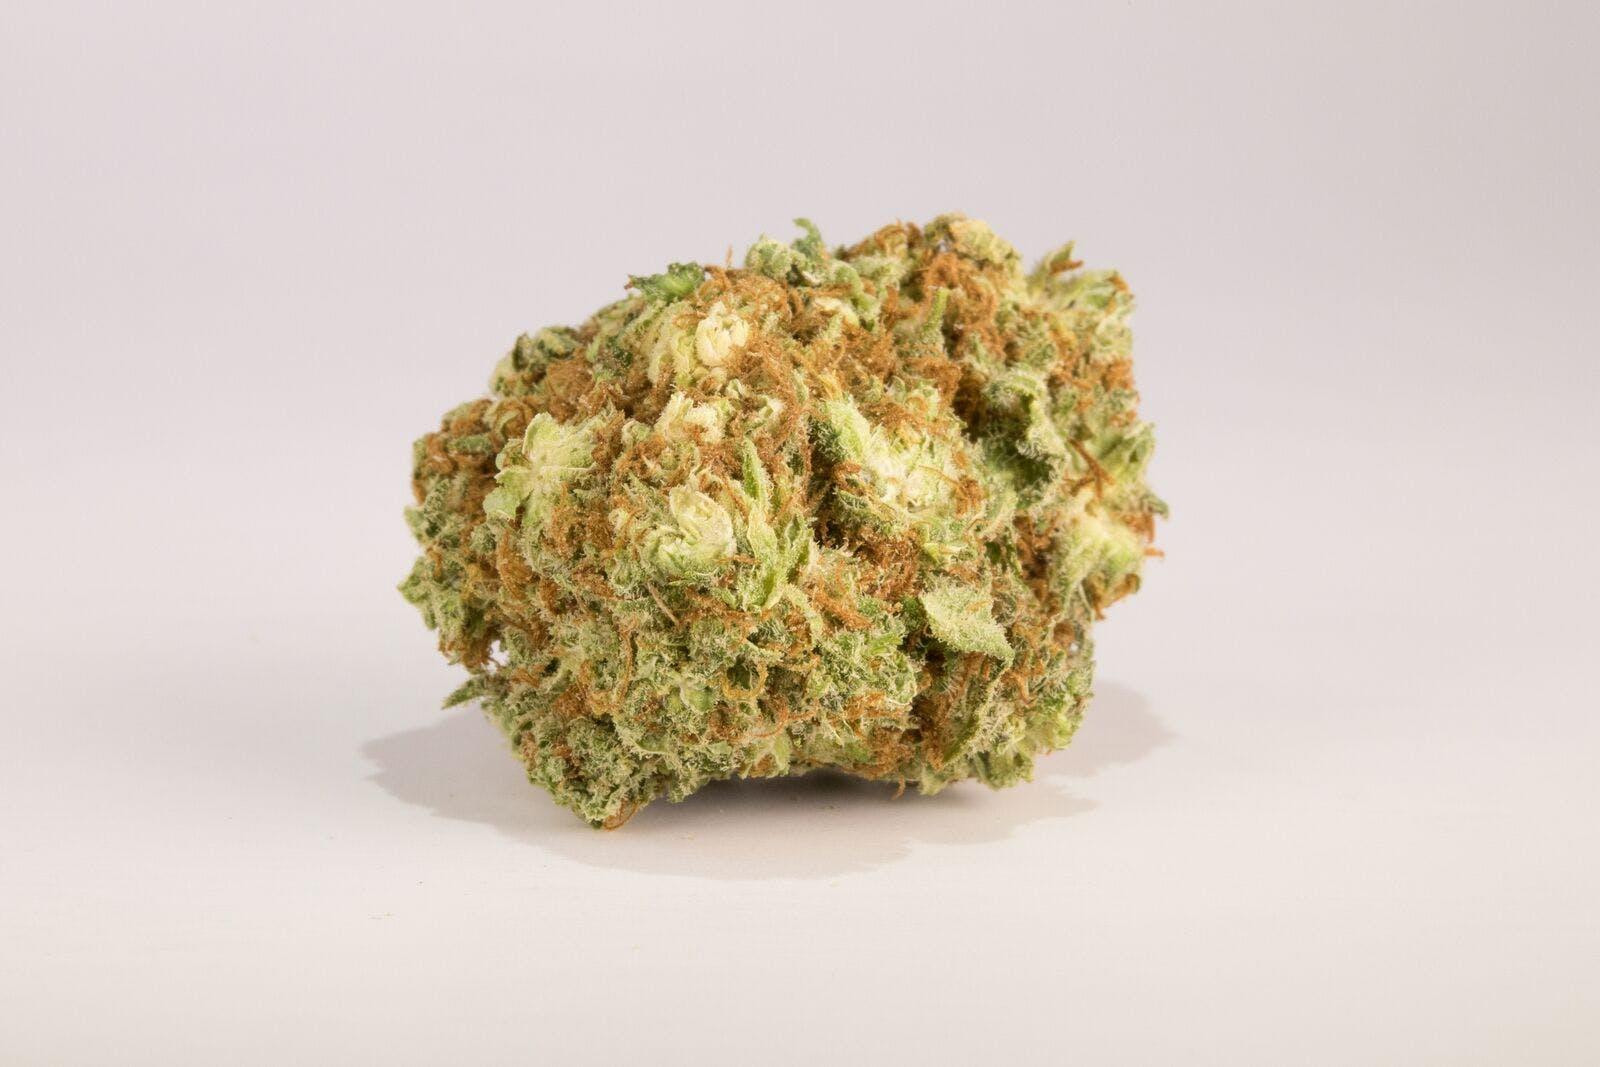 Sour Amnesia Weed, Sour Amnesia Cannabis Strain, Sour Amnesia Sativa Marijuana Strain